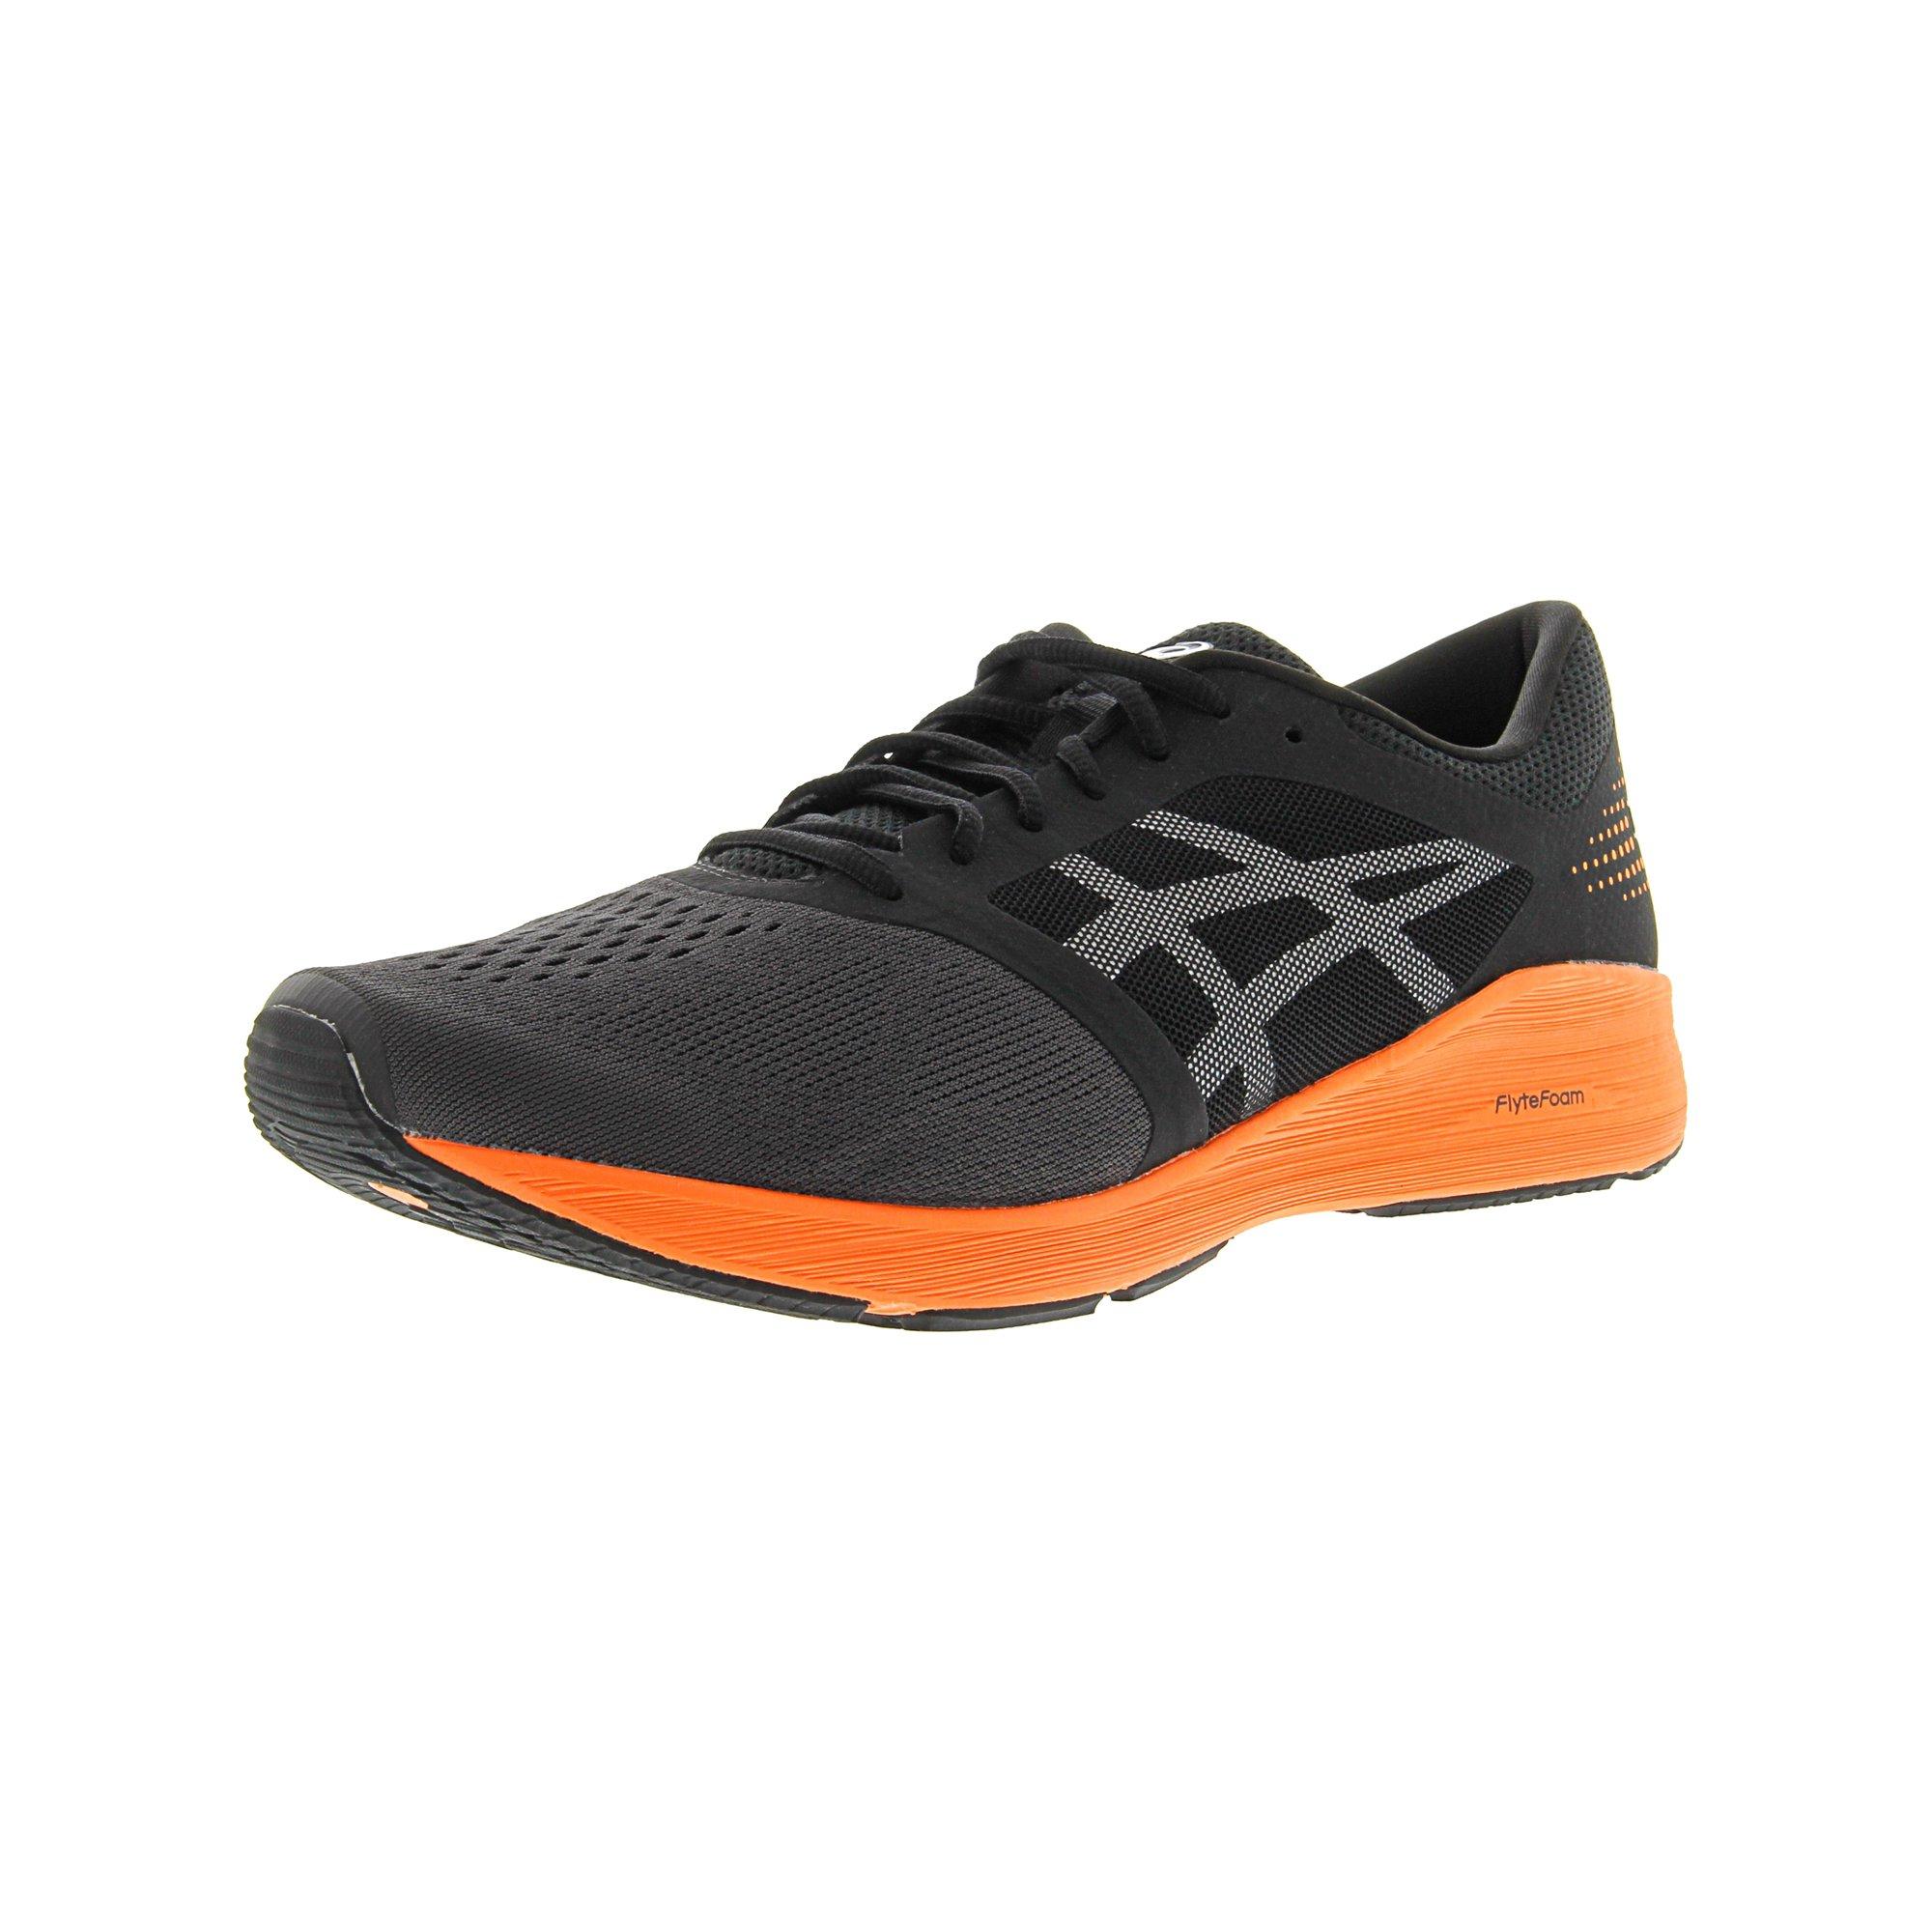 buy popular 2dc16 f078d Asics Men's Roadhawk Ff Black / White Silver Ankle-High Running Shoe - 15M